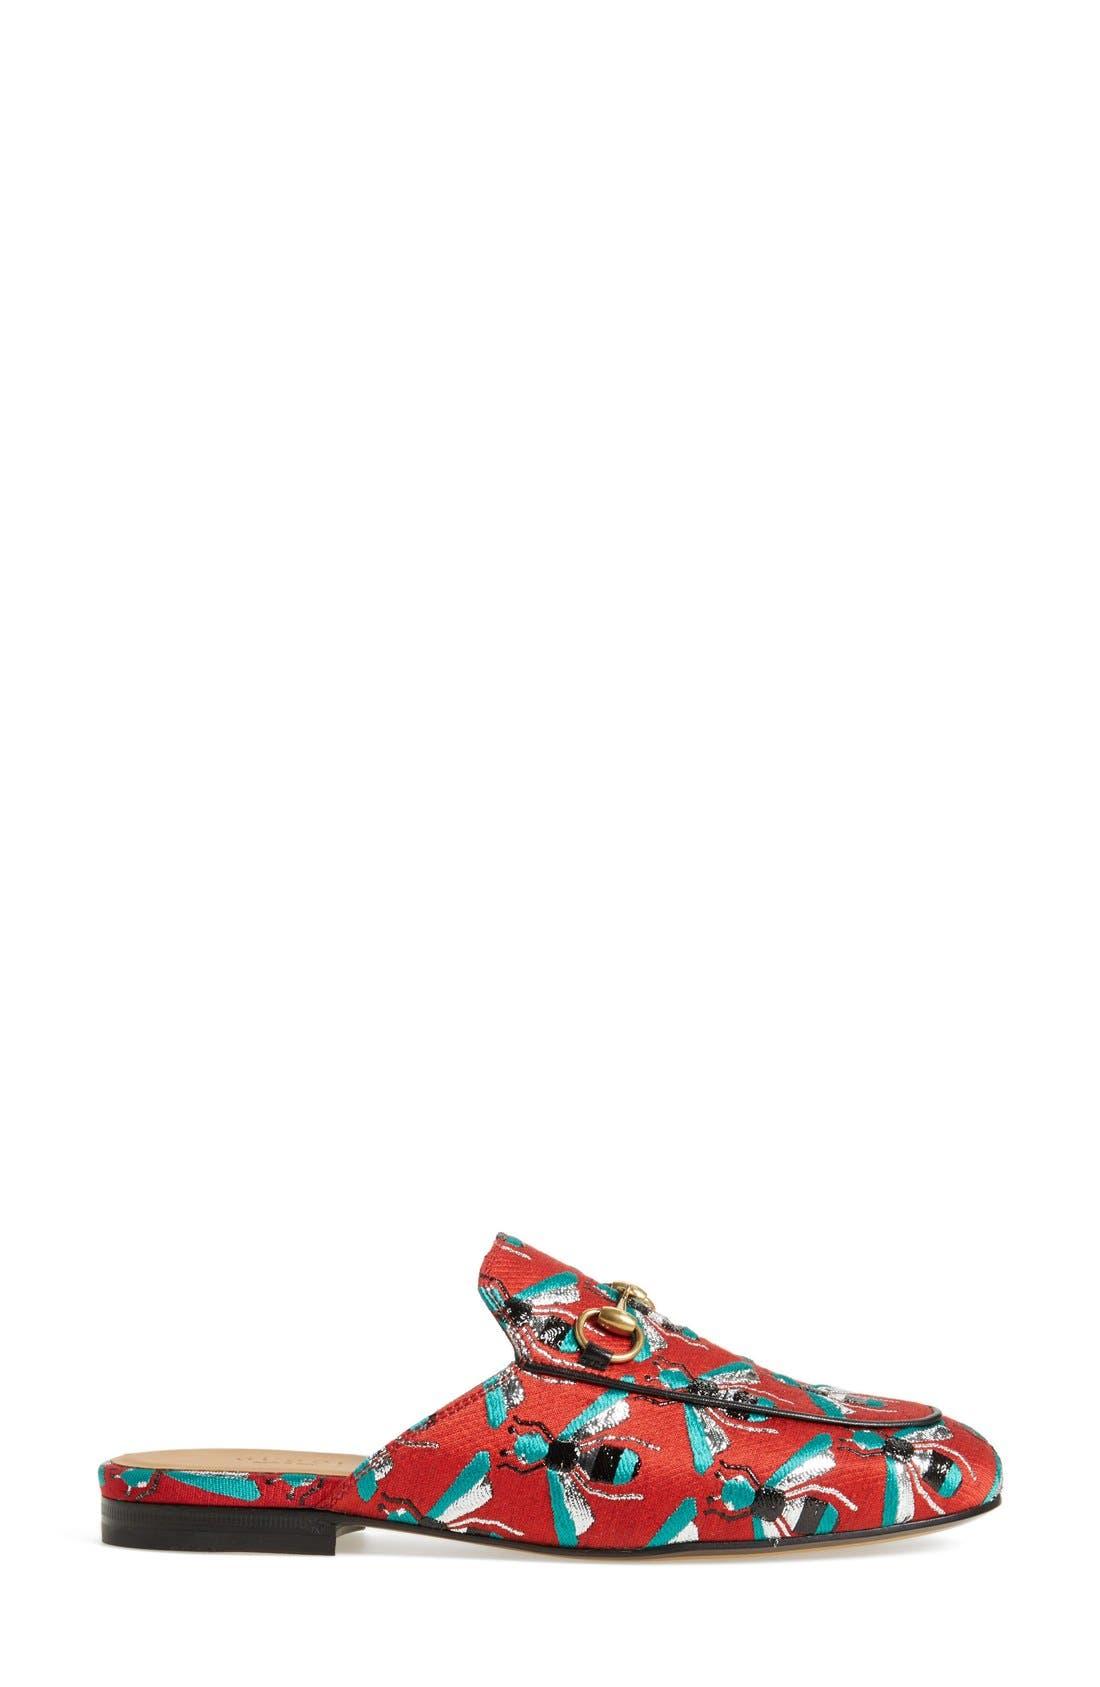 Alternate Image 4  - Gucci 'Princetown' Print Mule Loafer (Women)